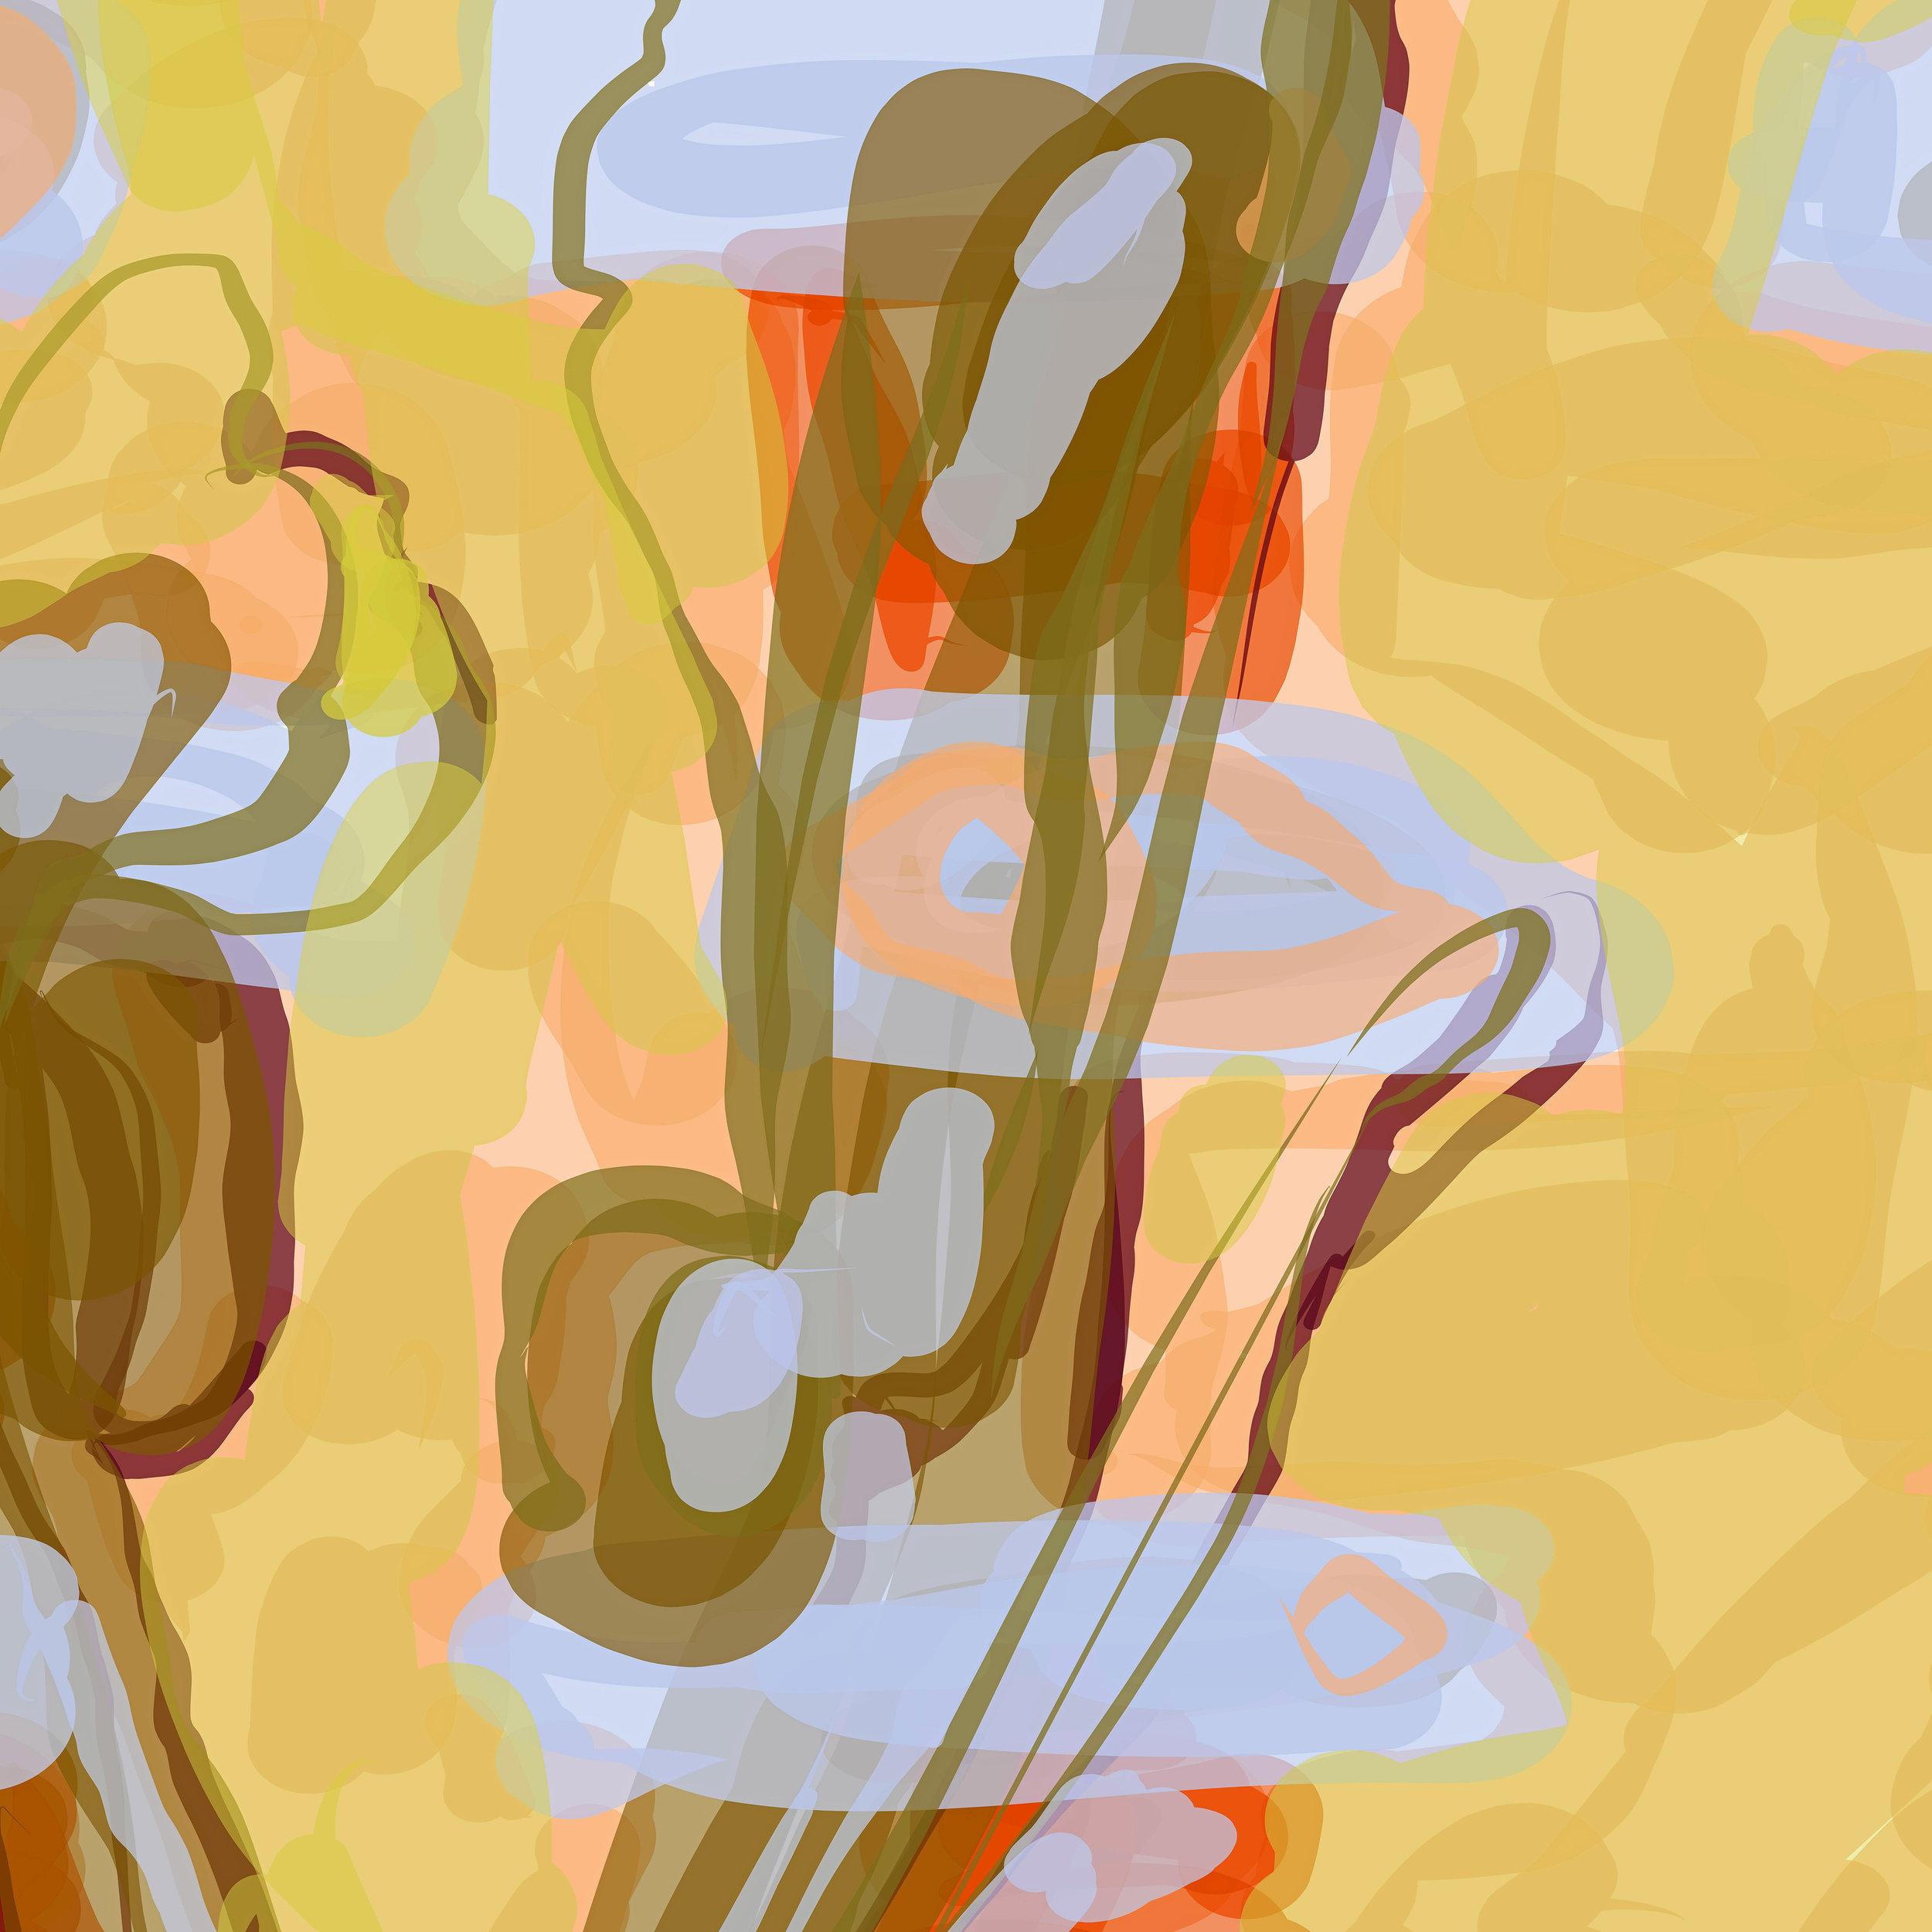 11may19 ipad image1 abstract_stream-vdetail3lrgmed.jpg